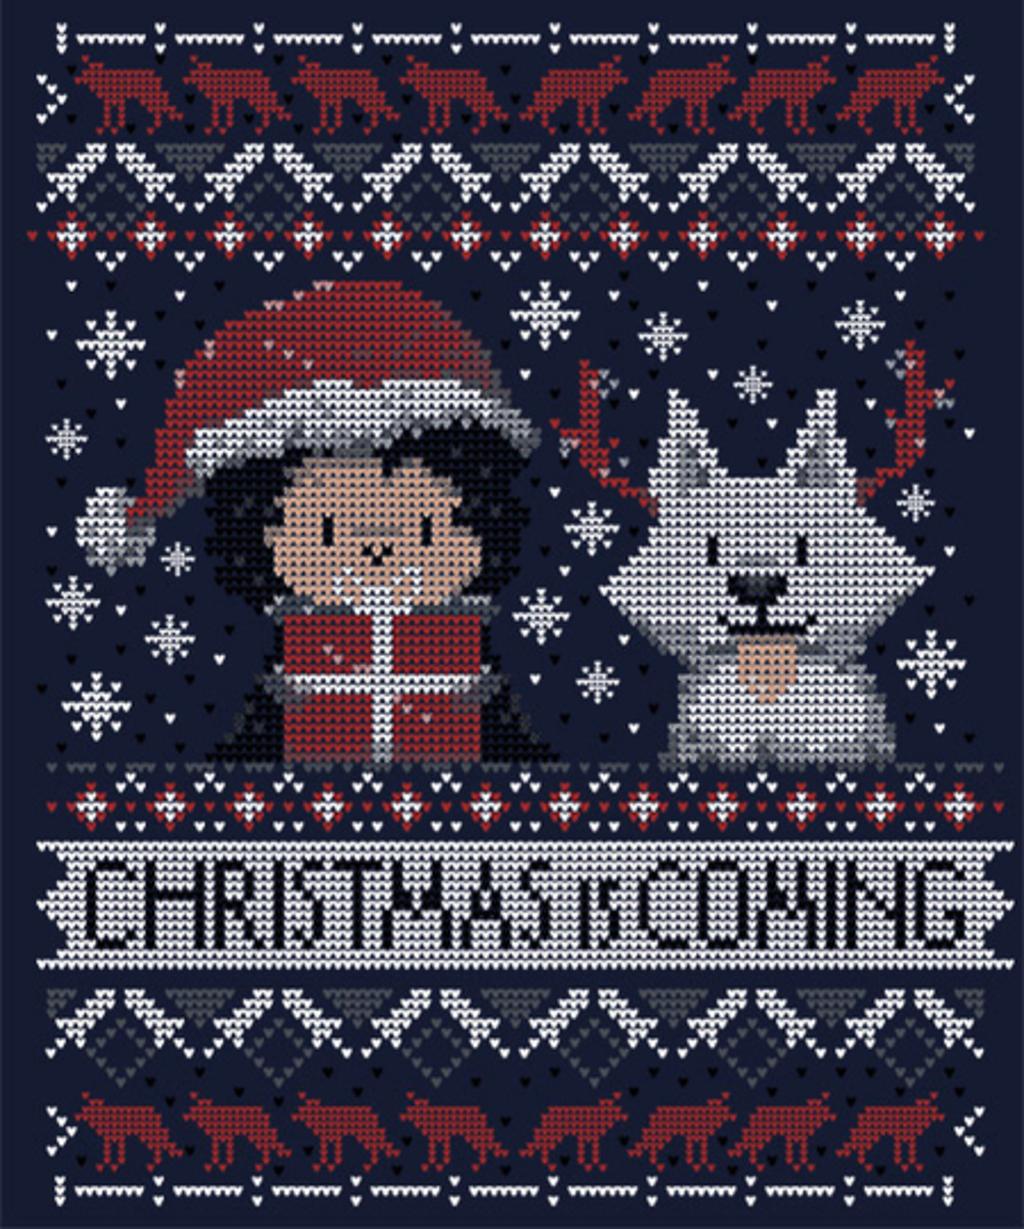 Qwertee: Christmas is coming